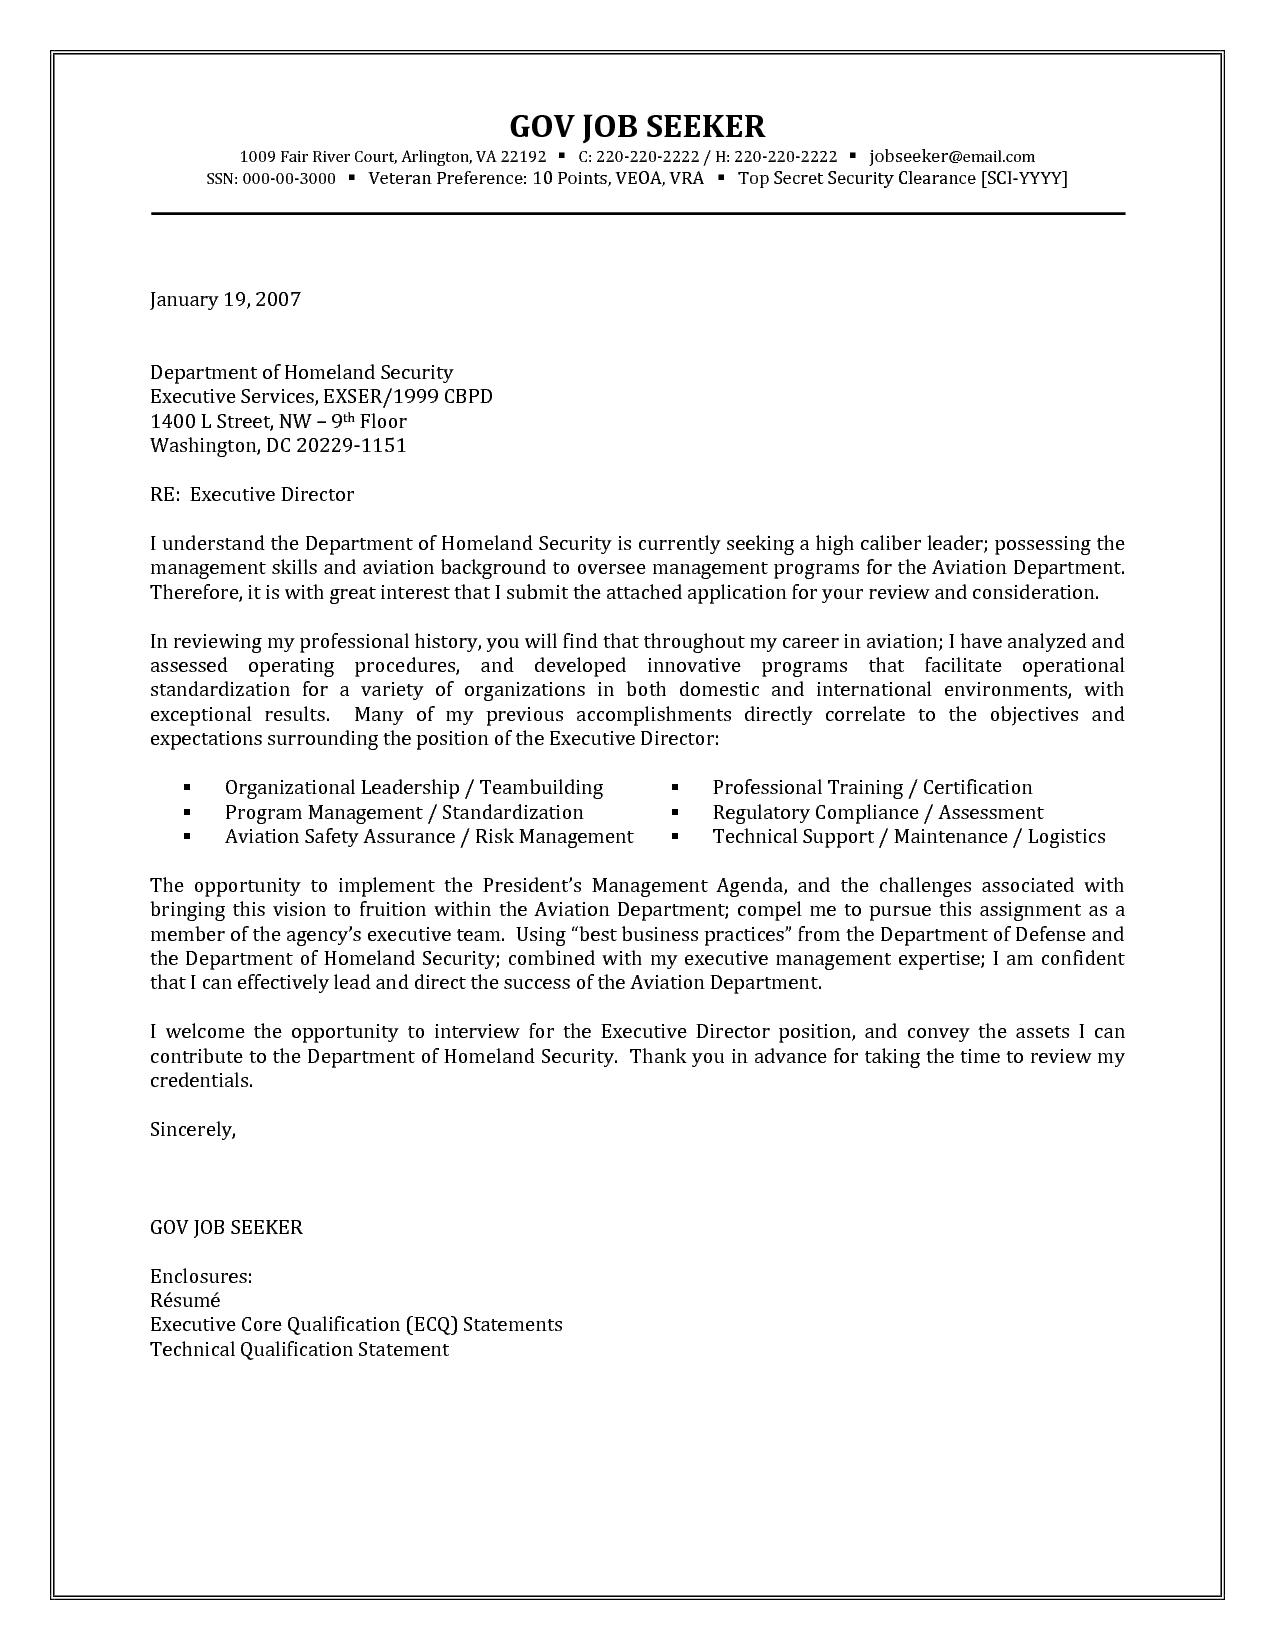 Job application motivation letter template spiritdancerdesigns Gallery